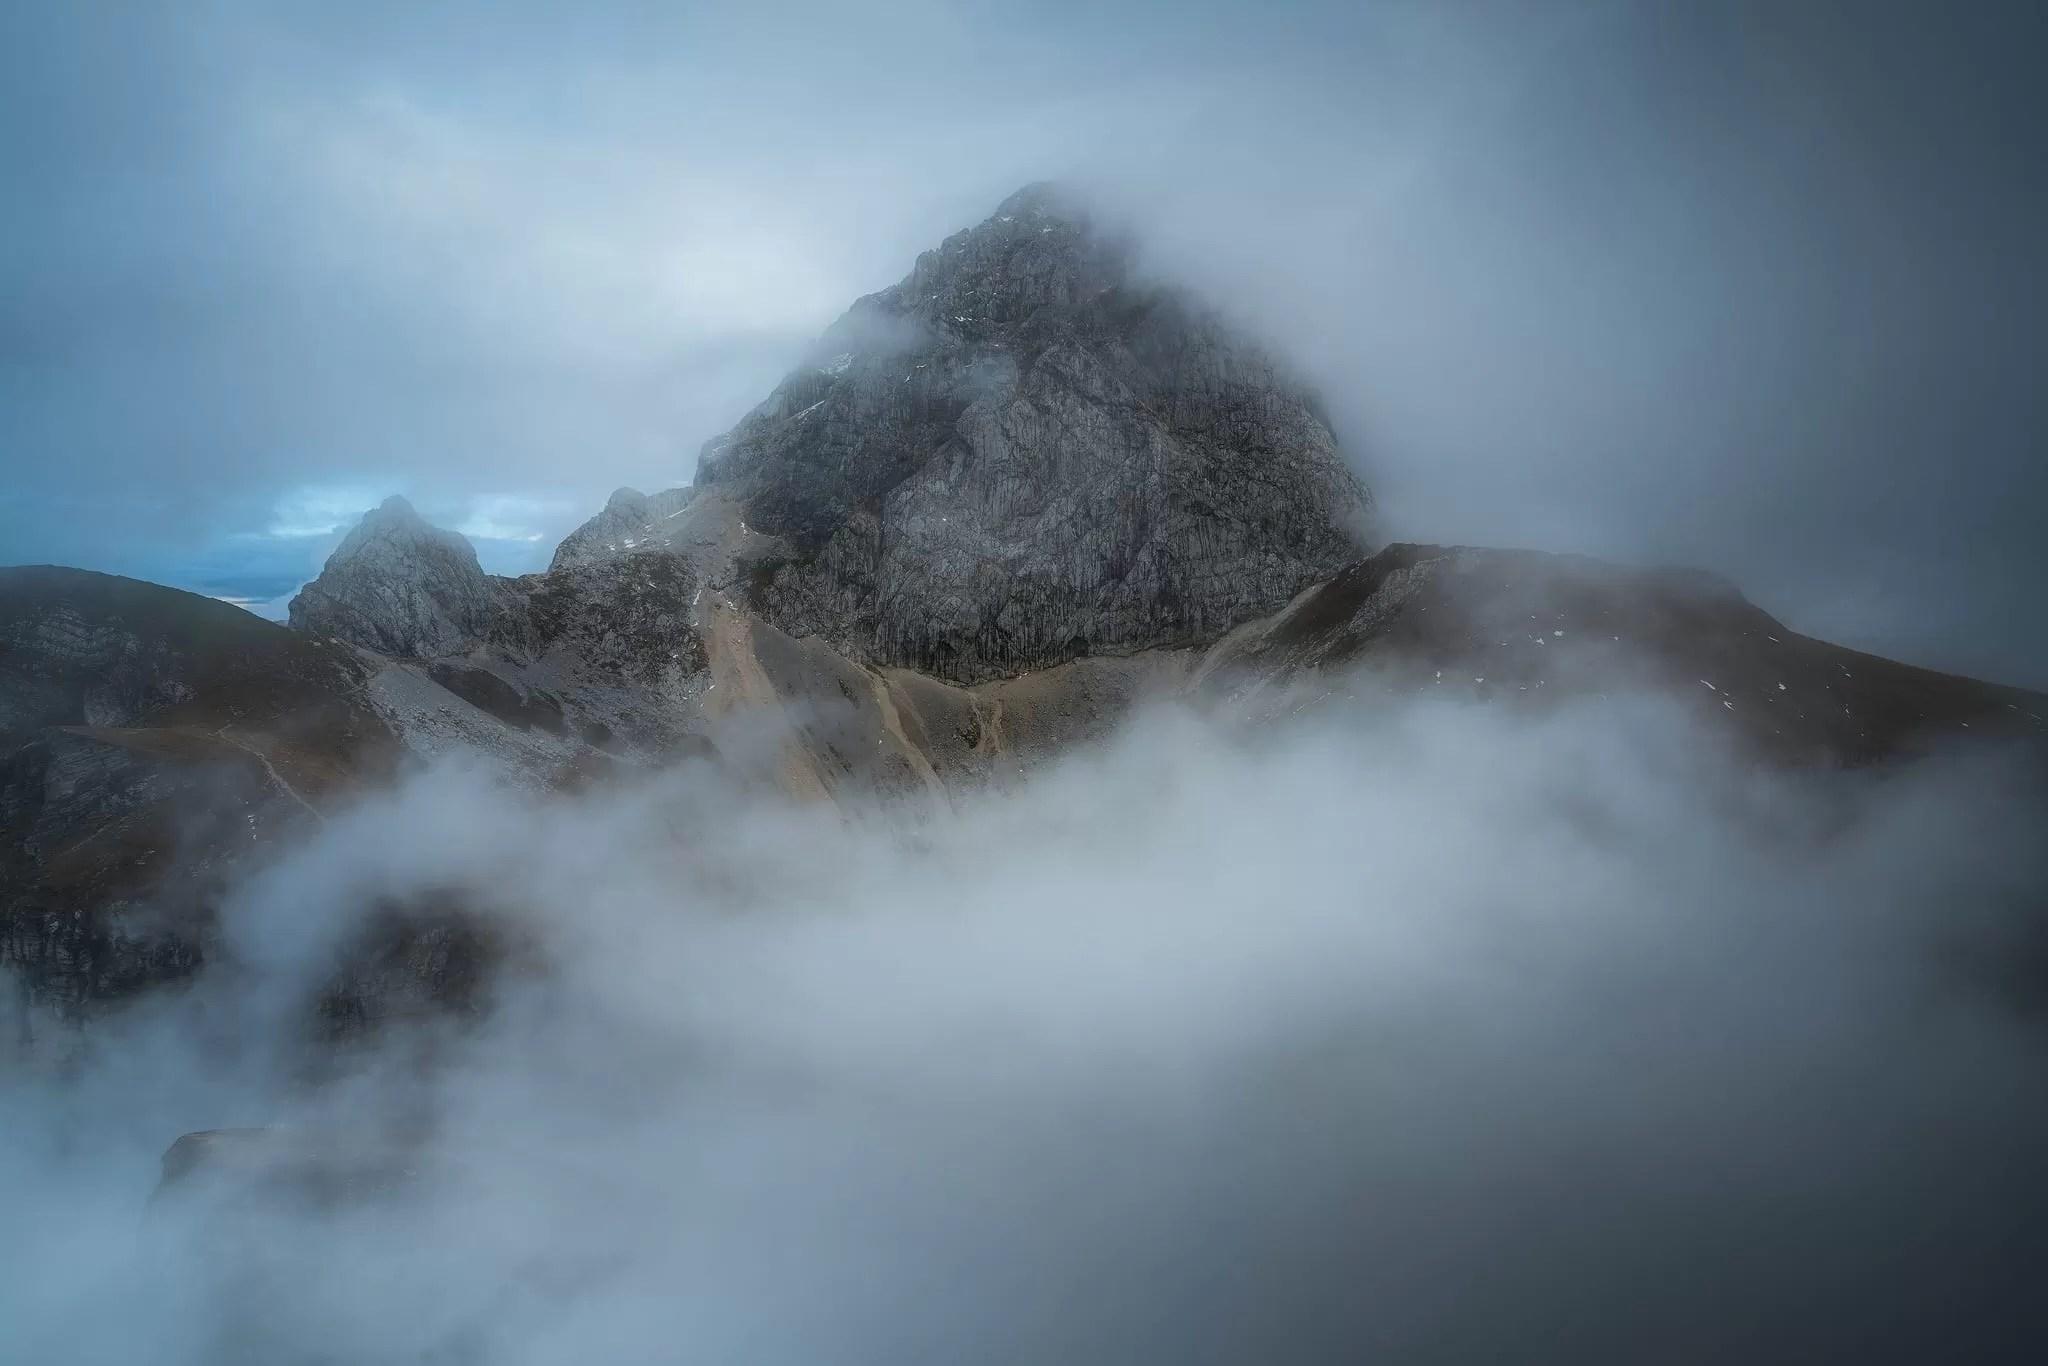 Mangart - Slovenia Landscape Photography